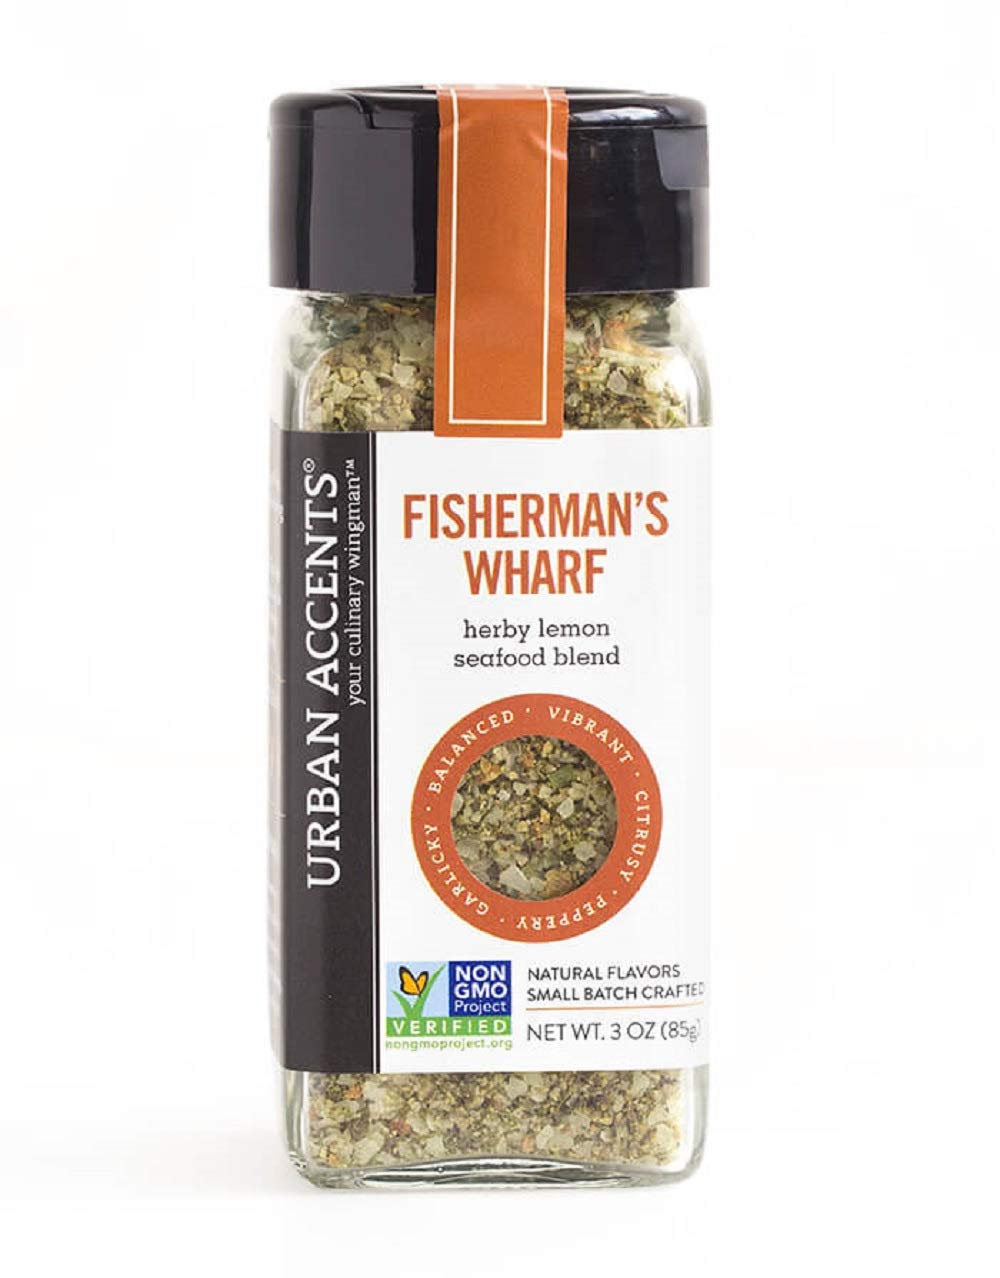 Fisherman's Wharf Seafood Seasoning